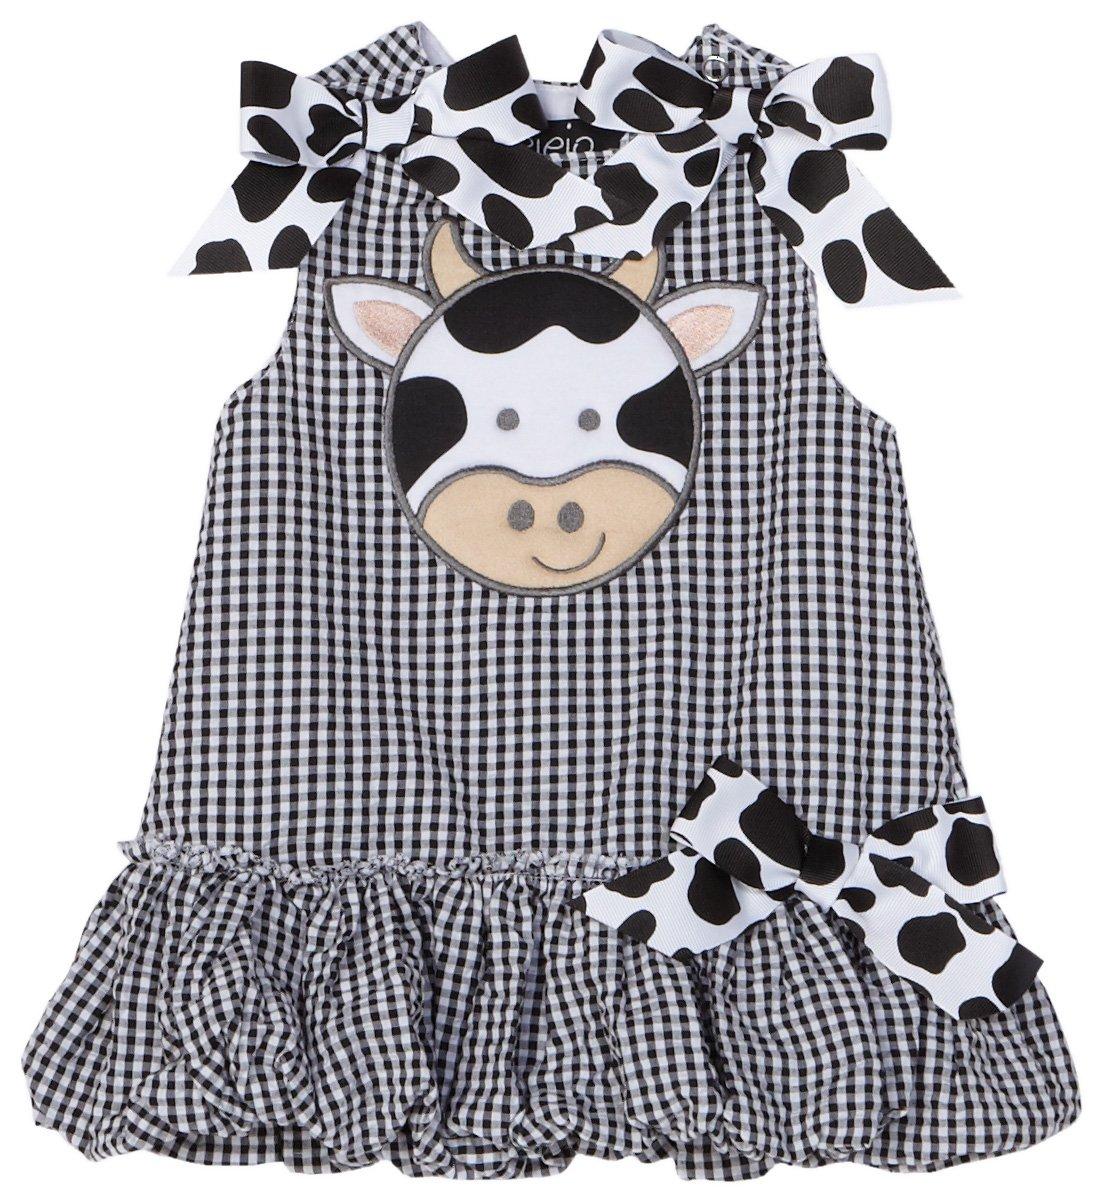 Clothing Shop Mud Pie Baby Eieio Black and White Gingham